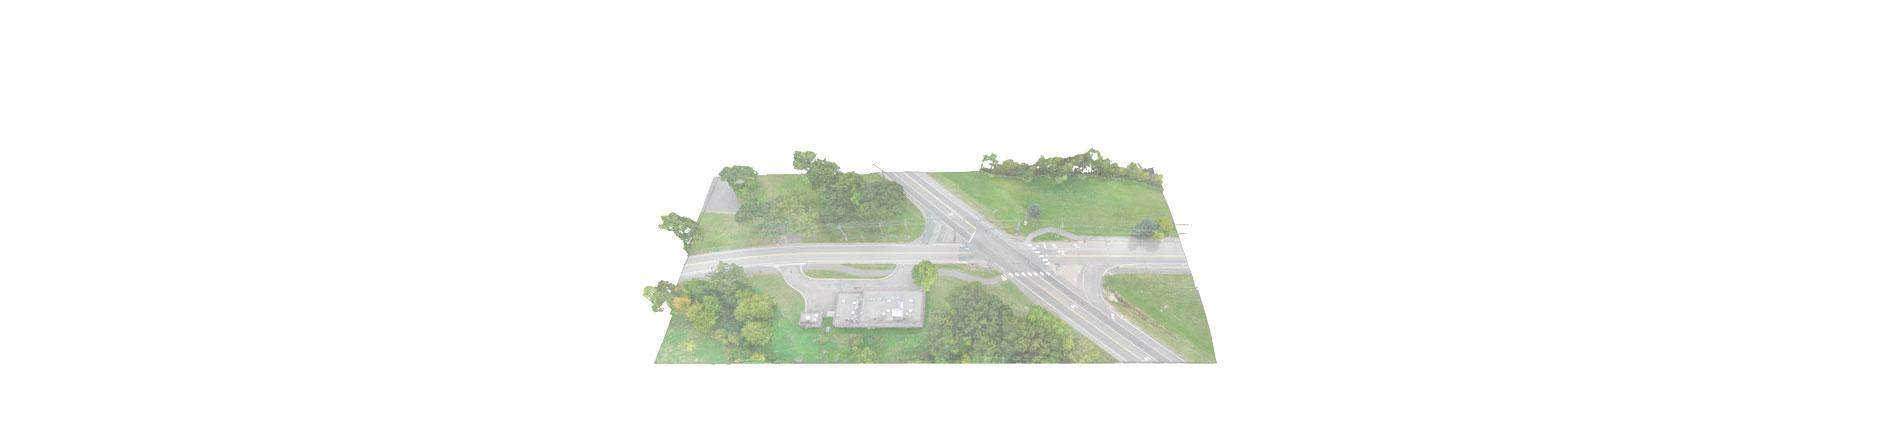 SimulationTerrain.jpg